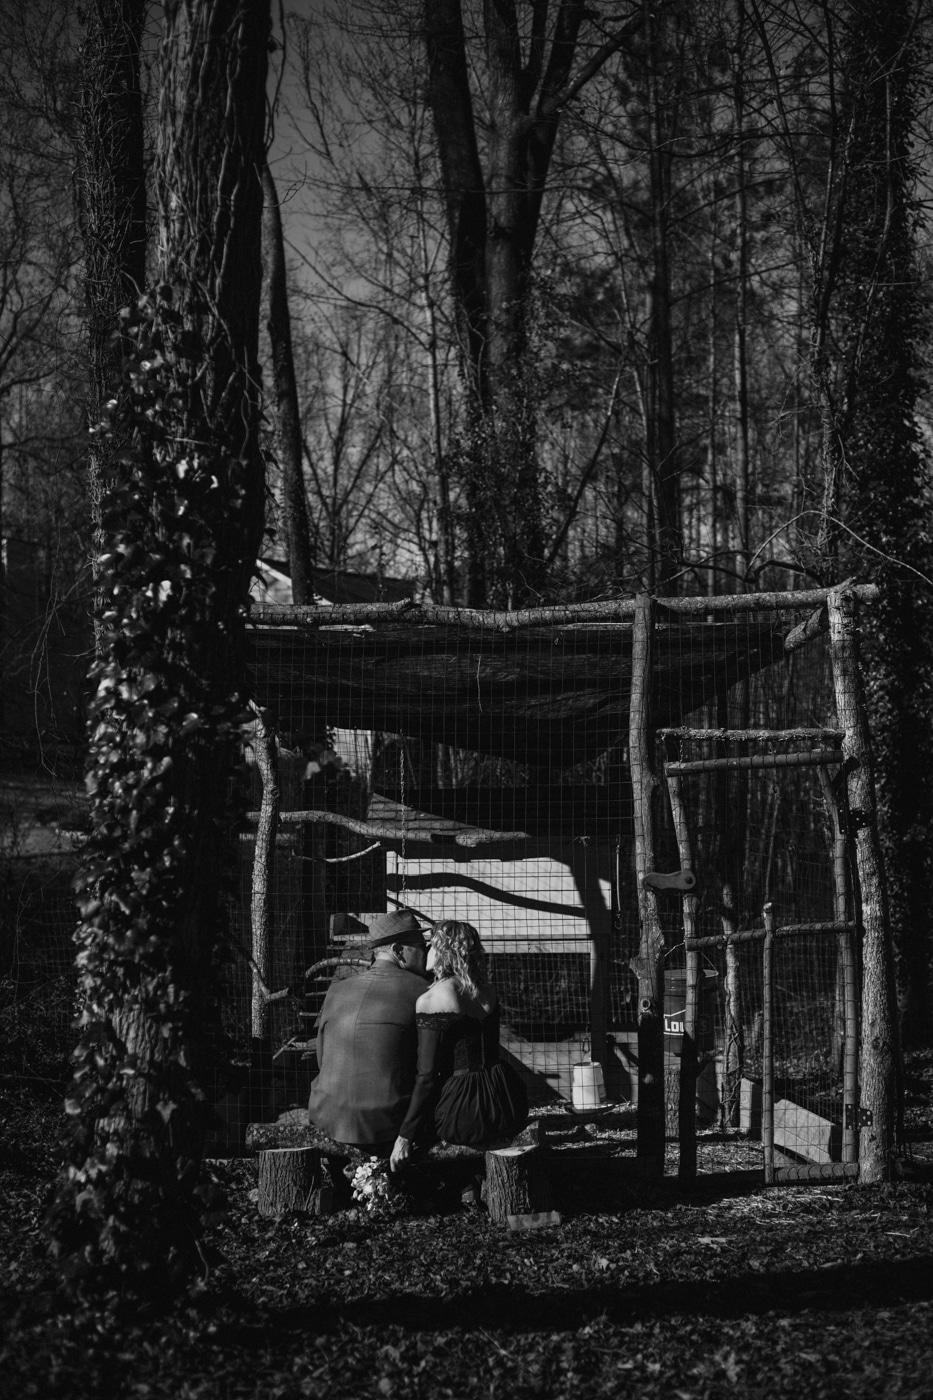 newlyweds pose by chicken coop in Atlanta GA